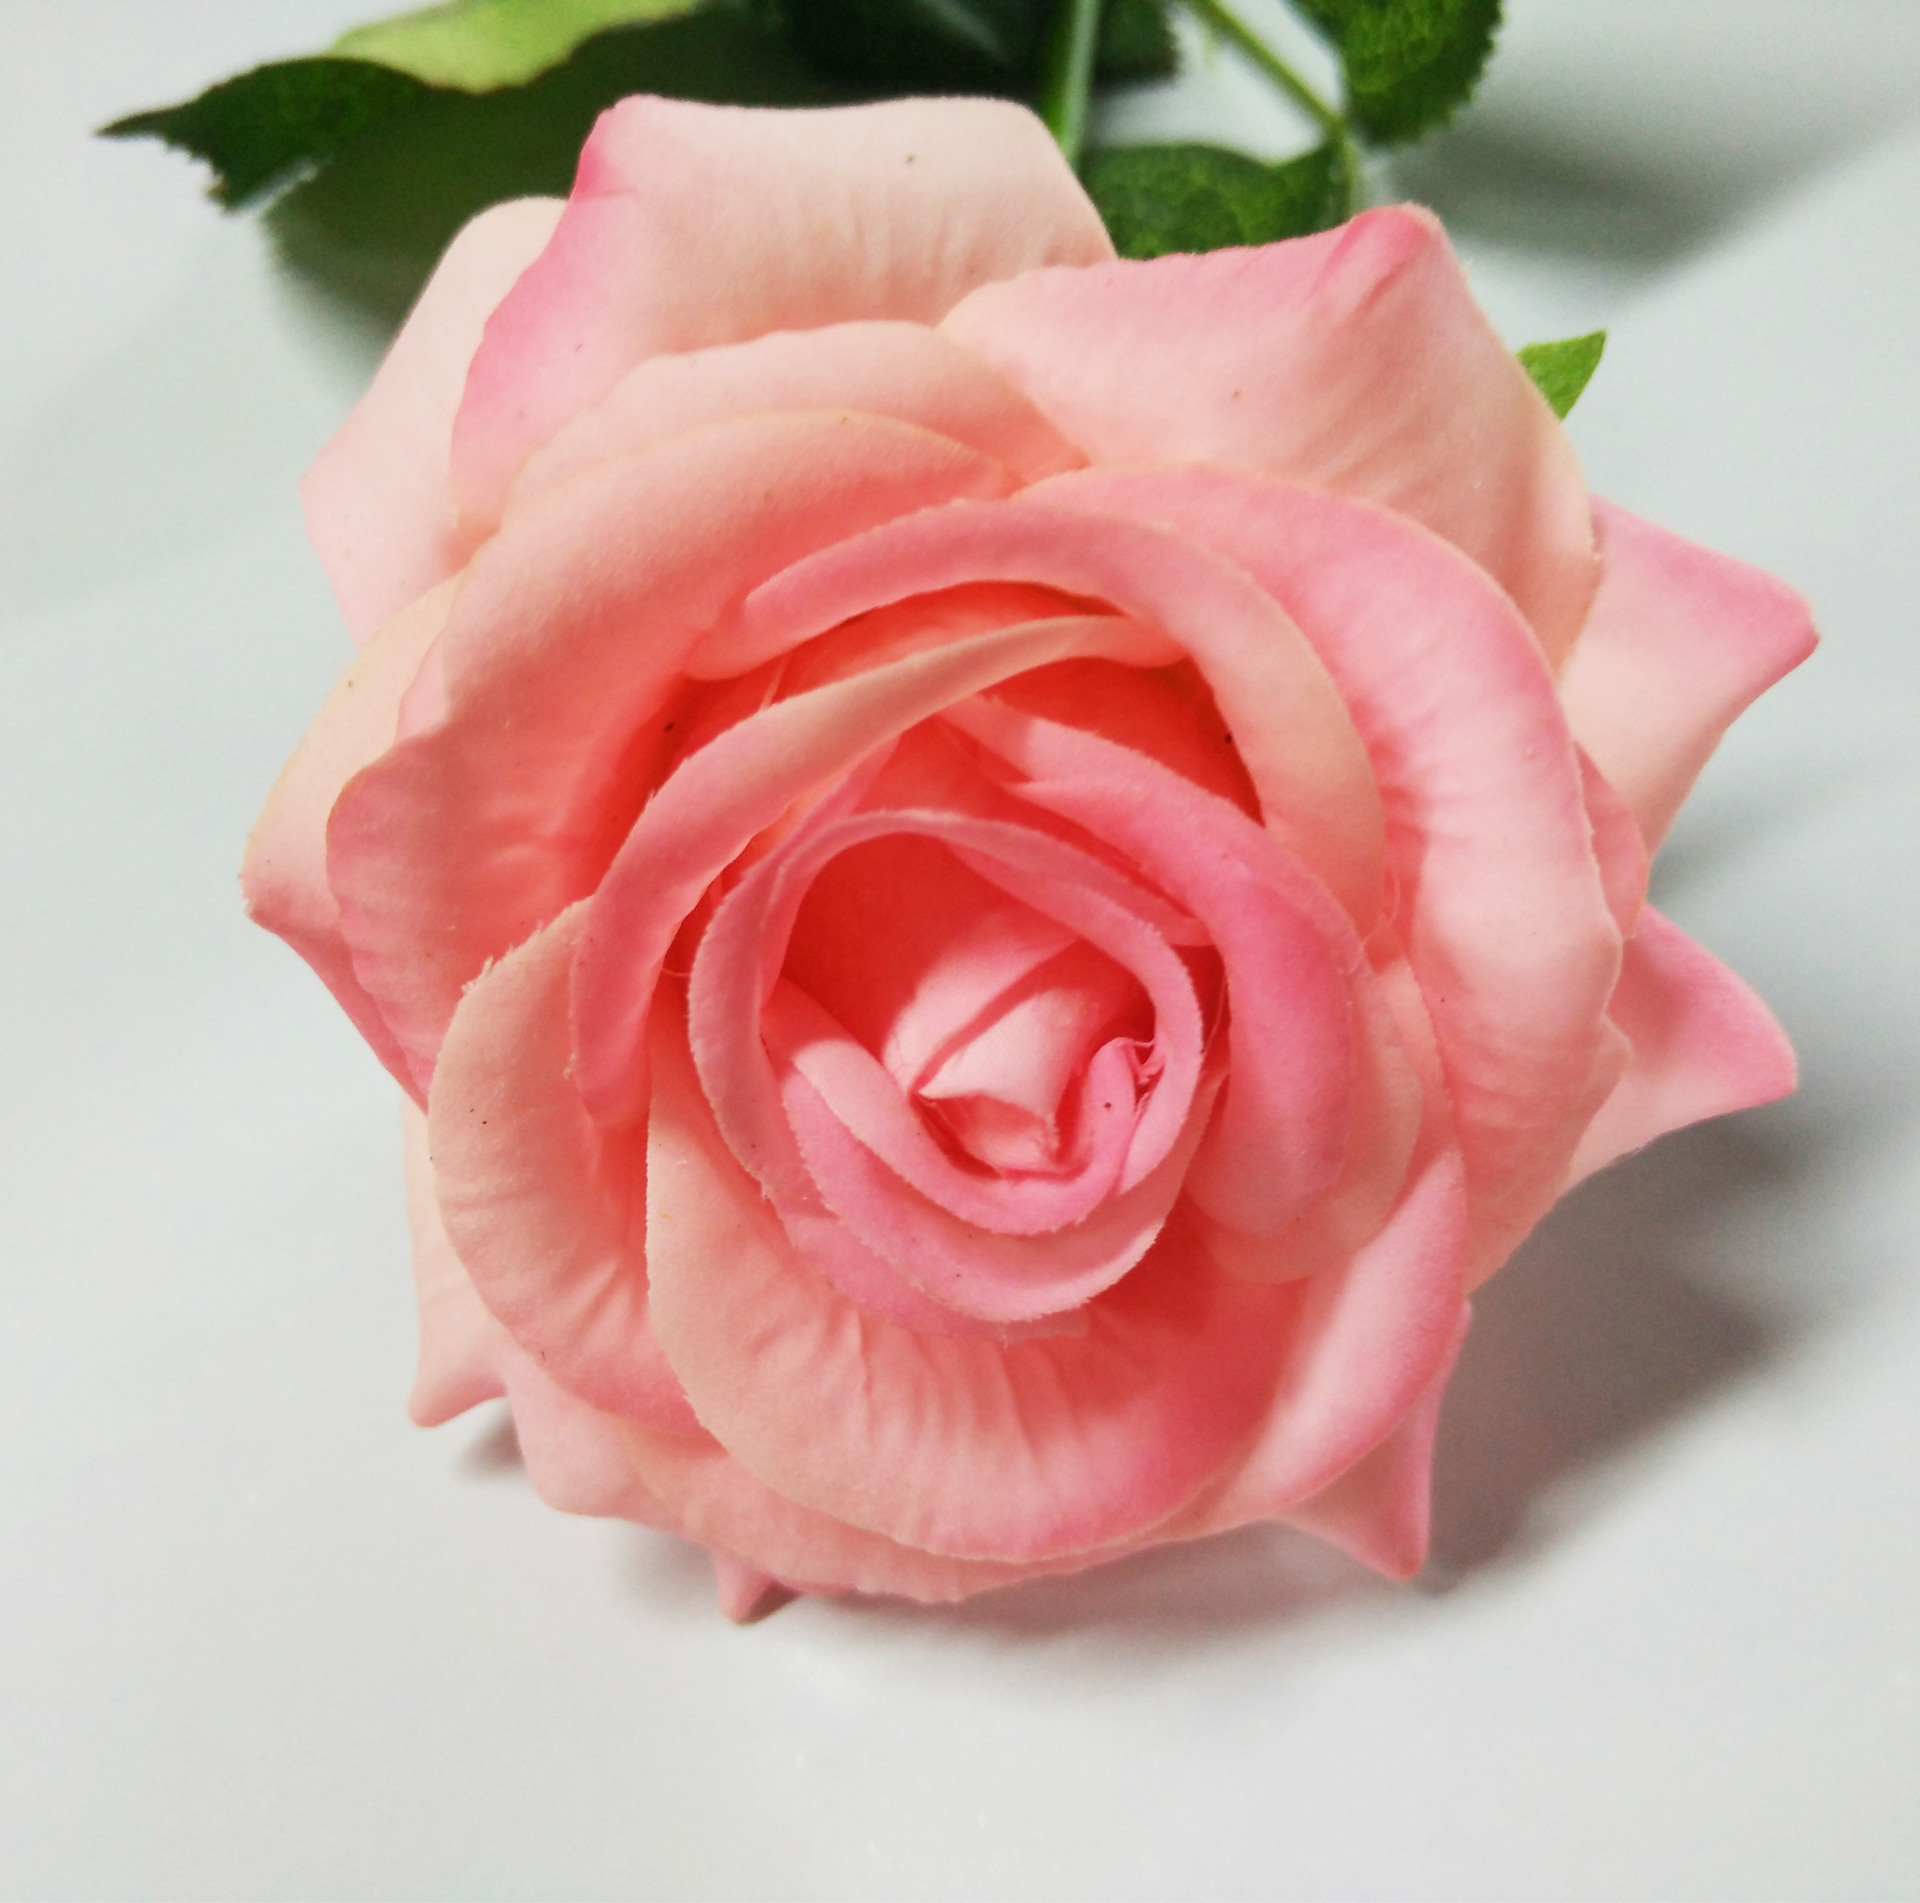 Hot Artificial Fake Rose Flower Arrangement Hotel Room Wedding Decor